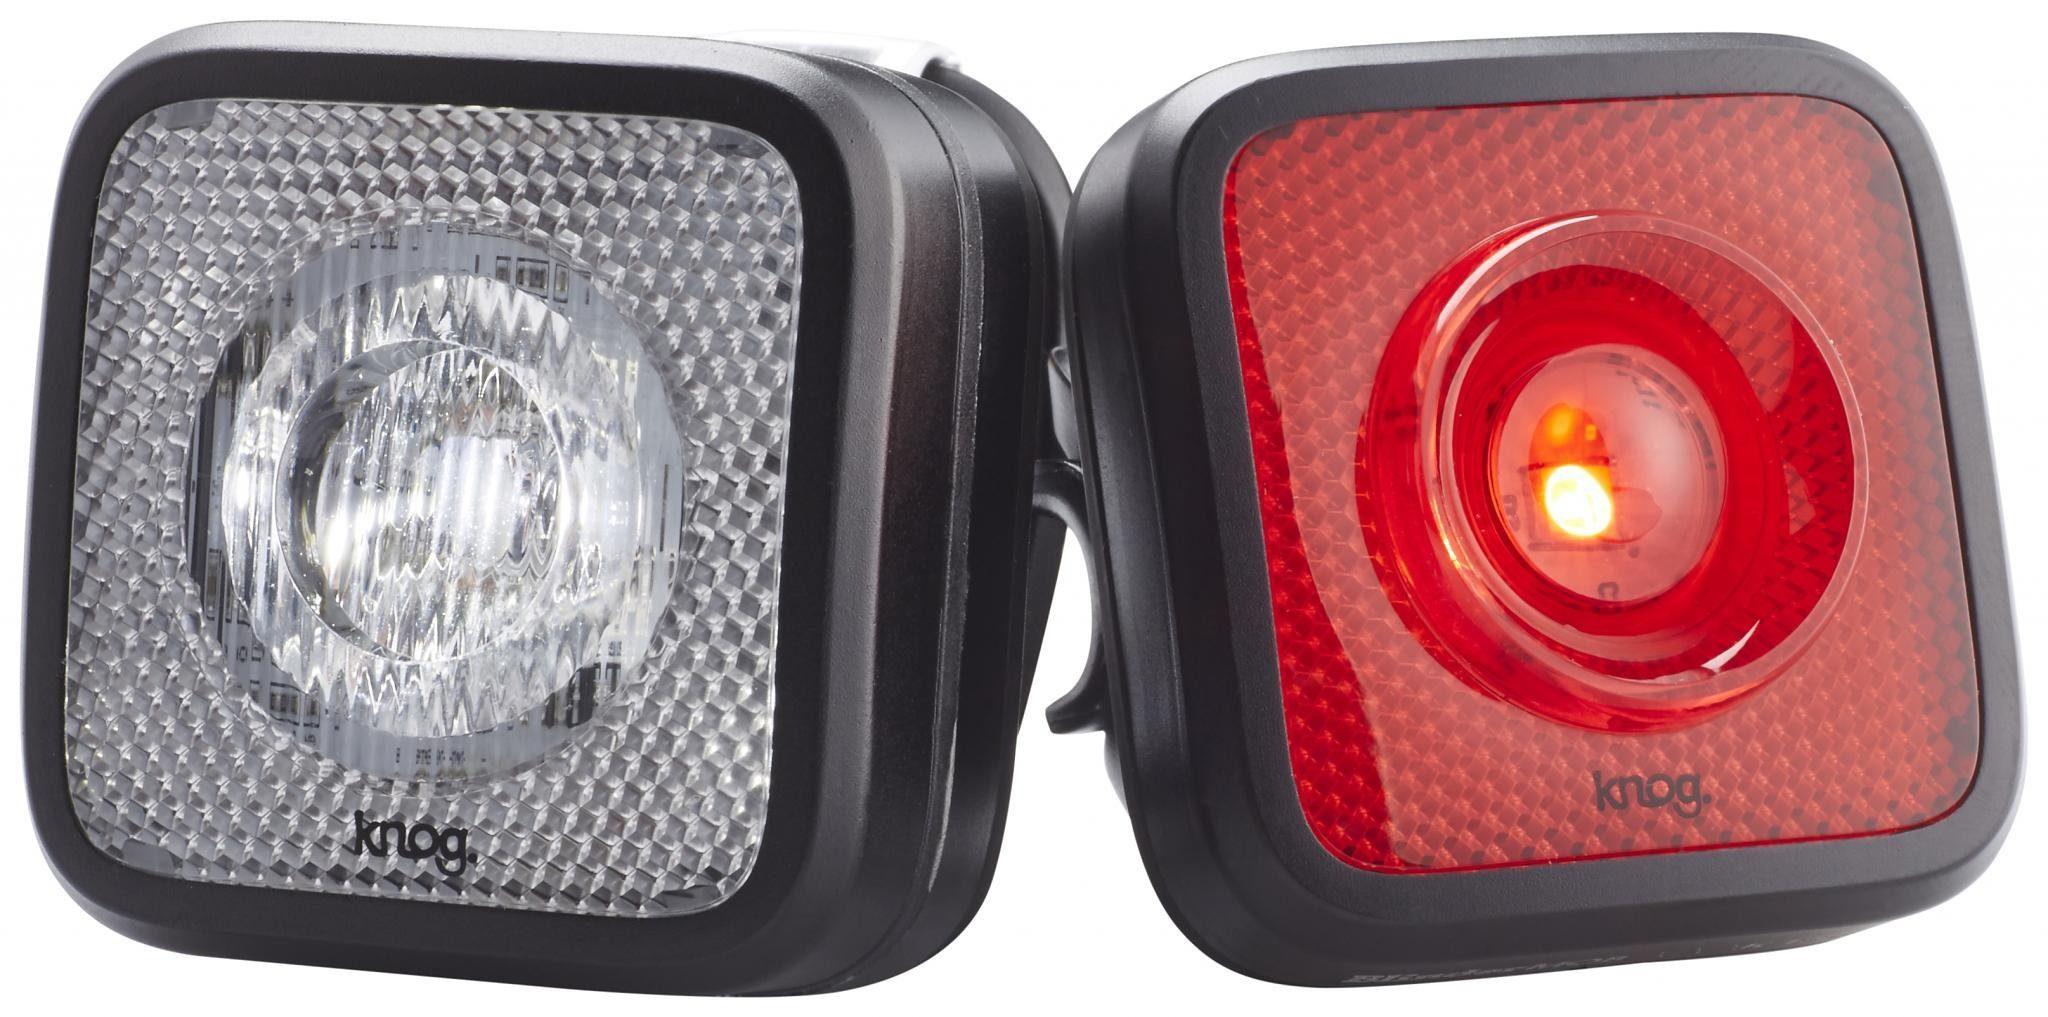 Knog Fahrradbeleuchtung »Knog Blinder MOB Beleuchtungsset StVZO Twinpack«